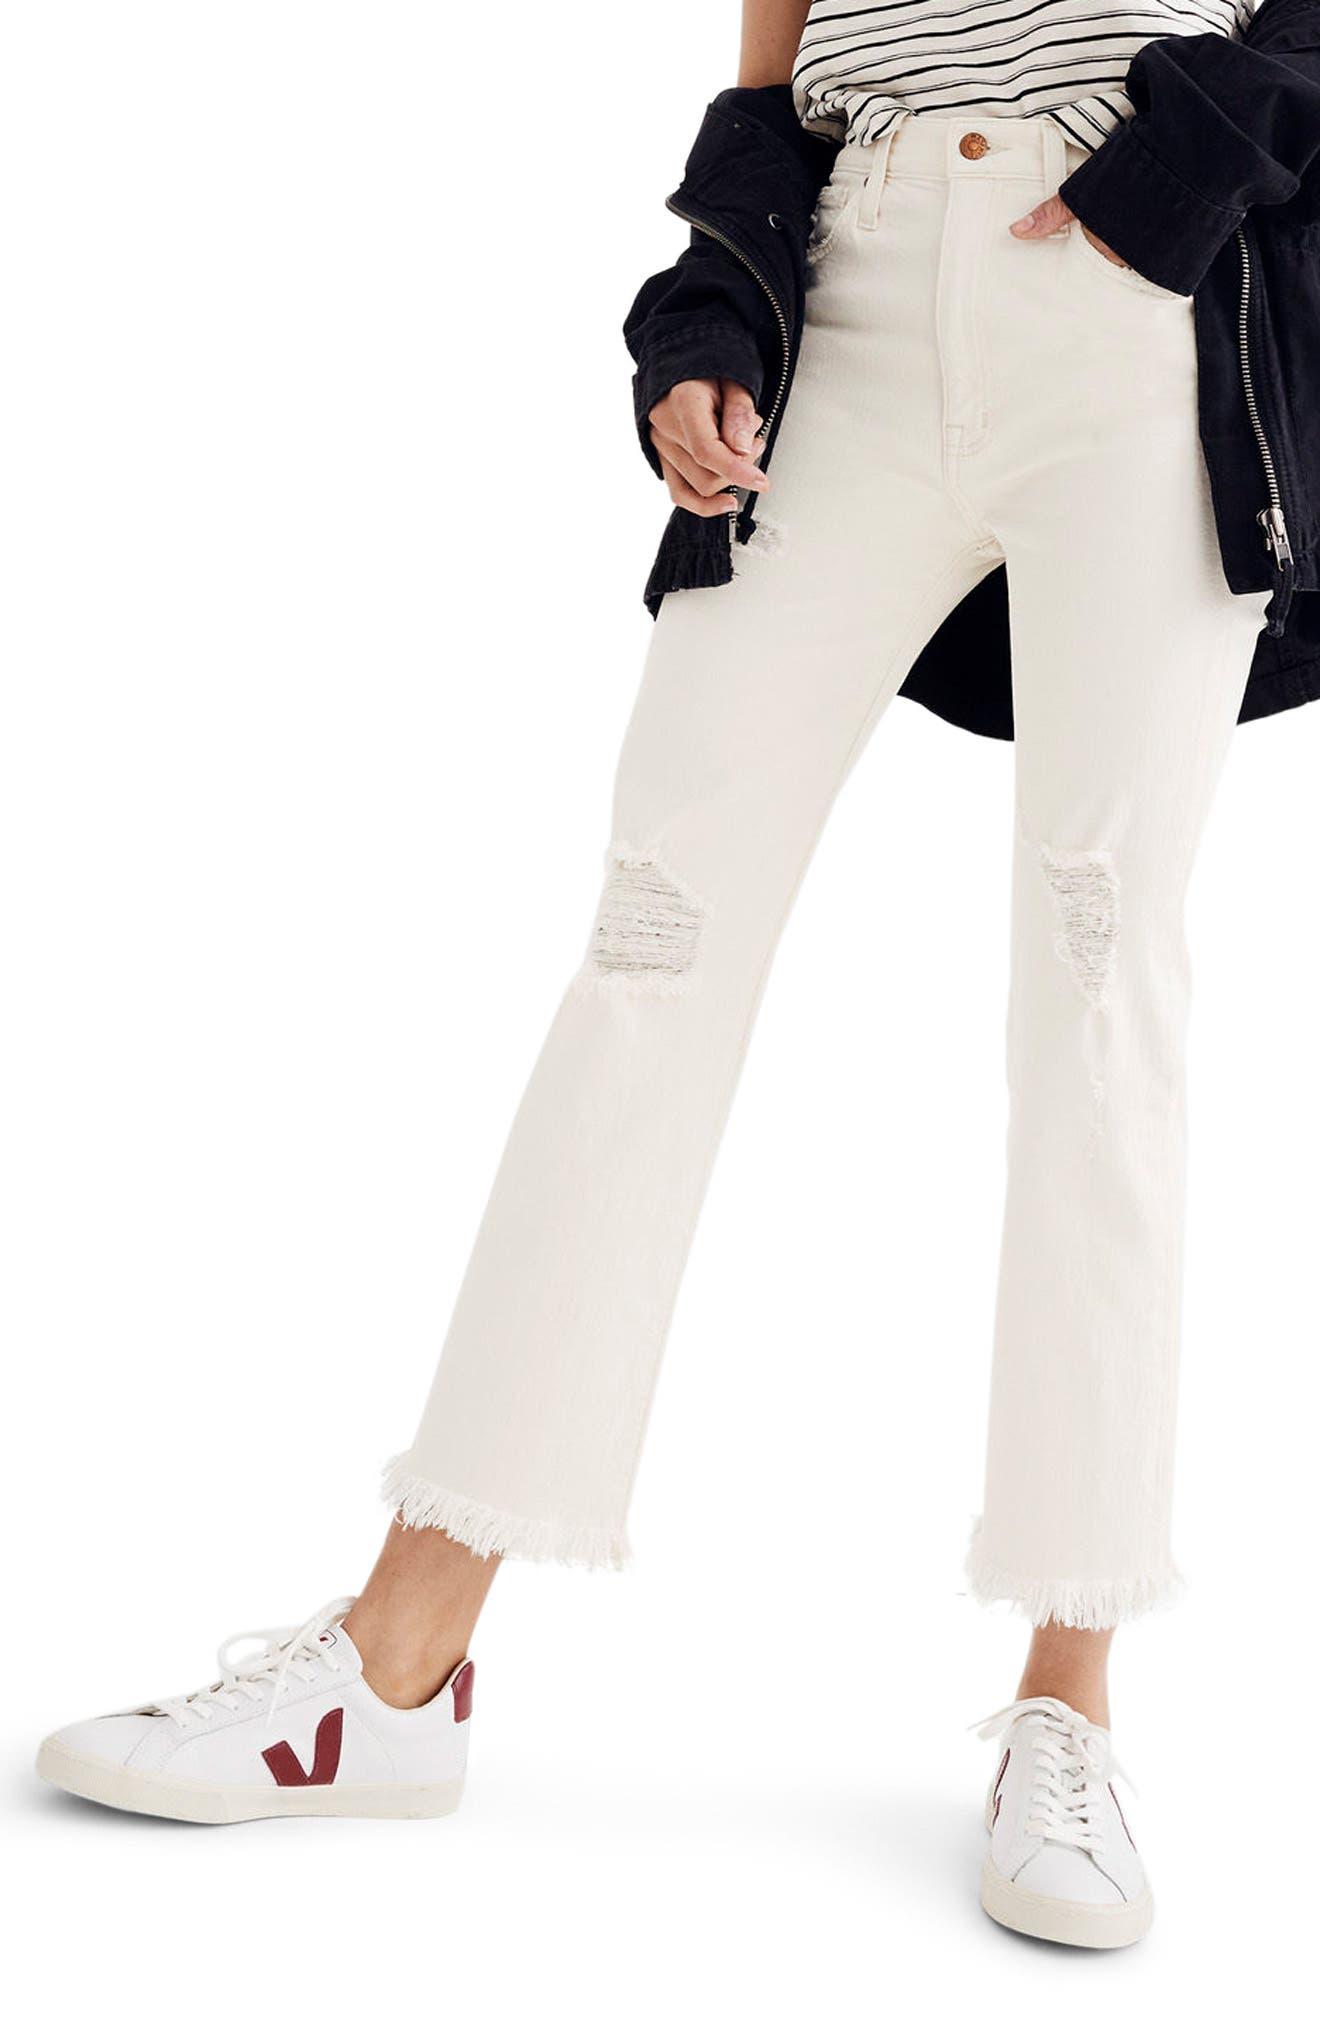 Madewell Retro Ripped Bootcut Crop Jeans (Ecru Wash)